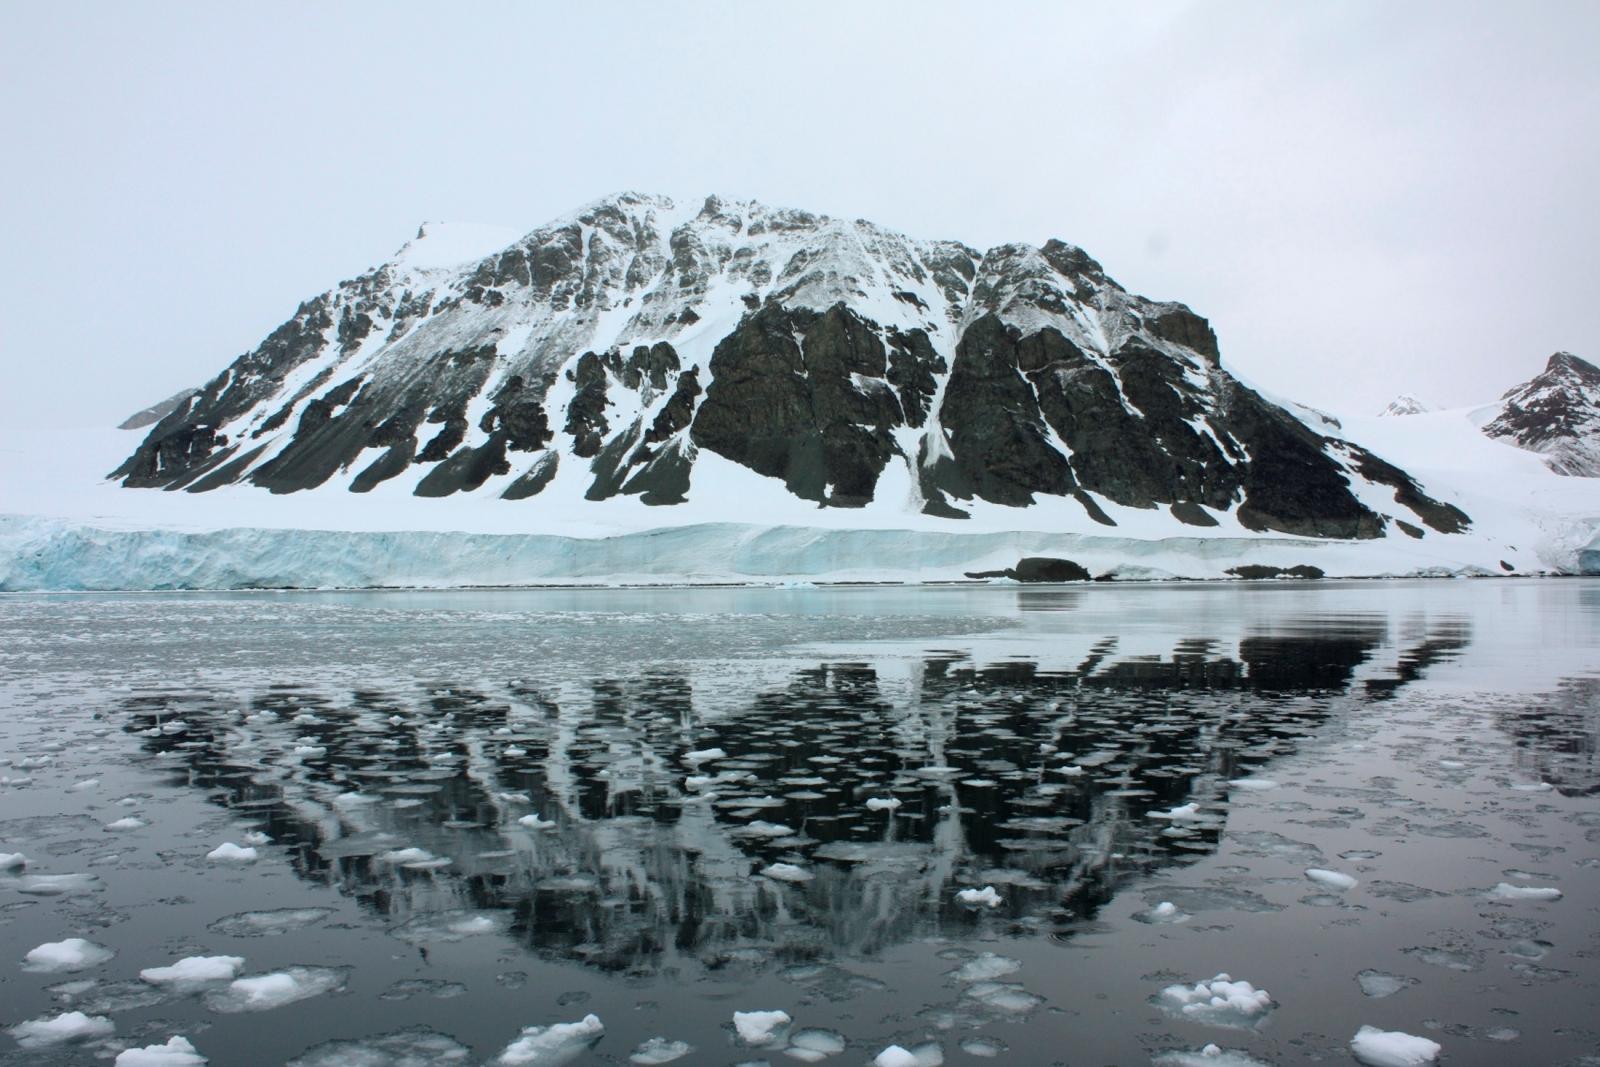 Mount Hope: Britain's New, Tallest Antarctic Possession